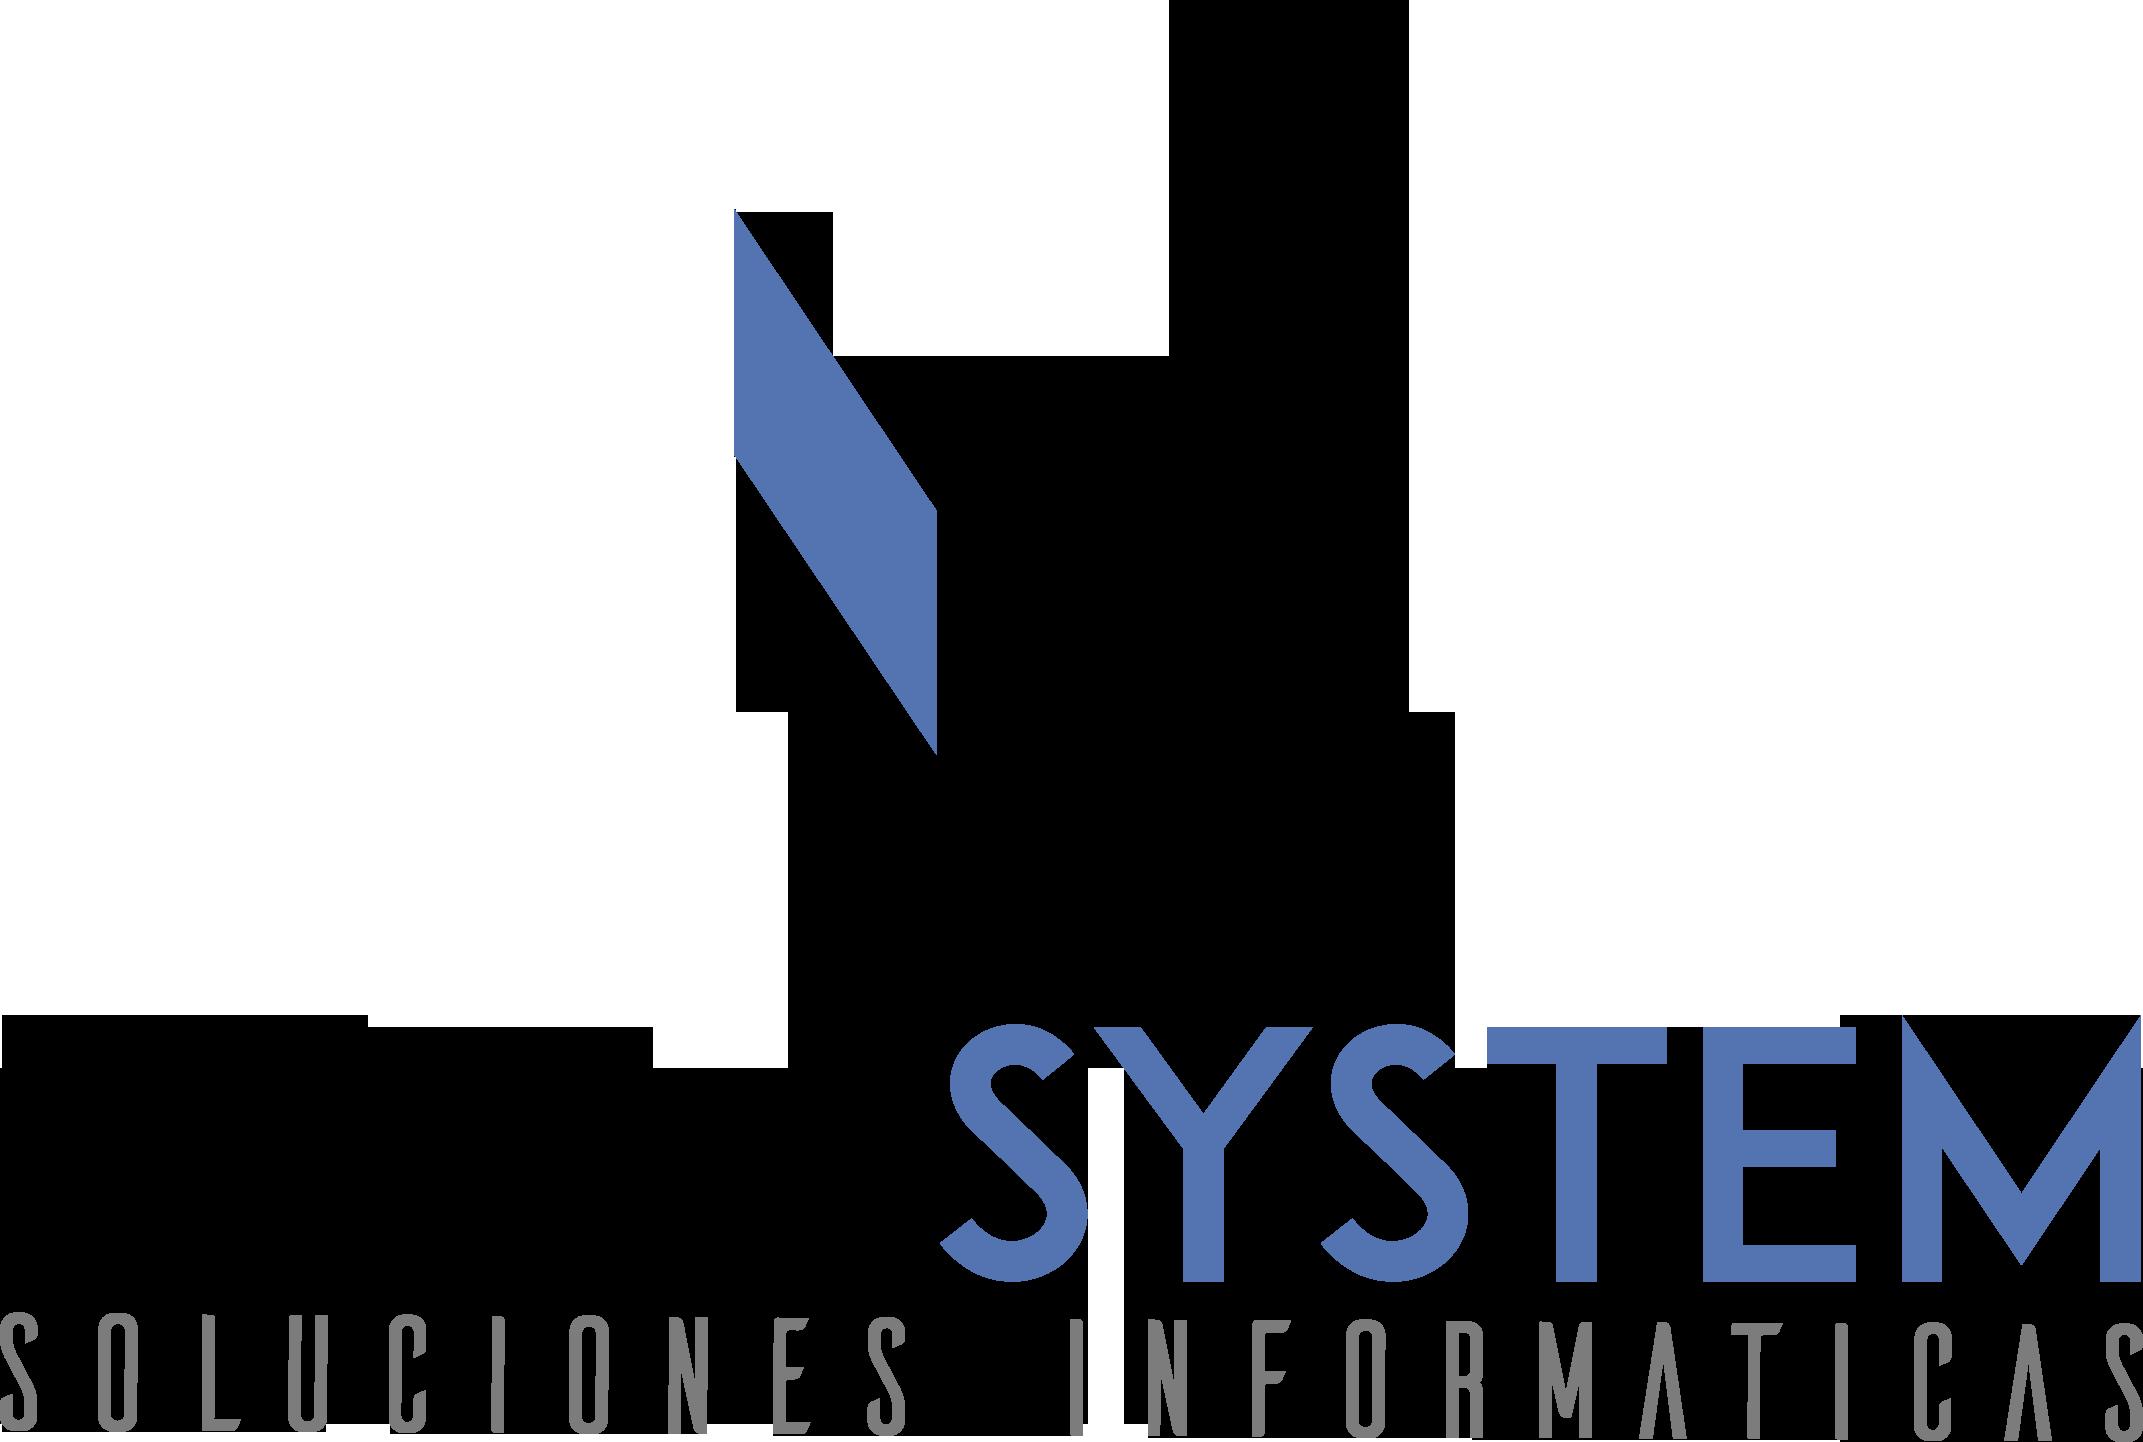 MegaSystem